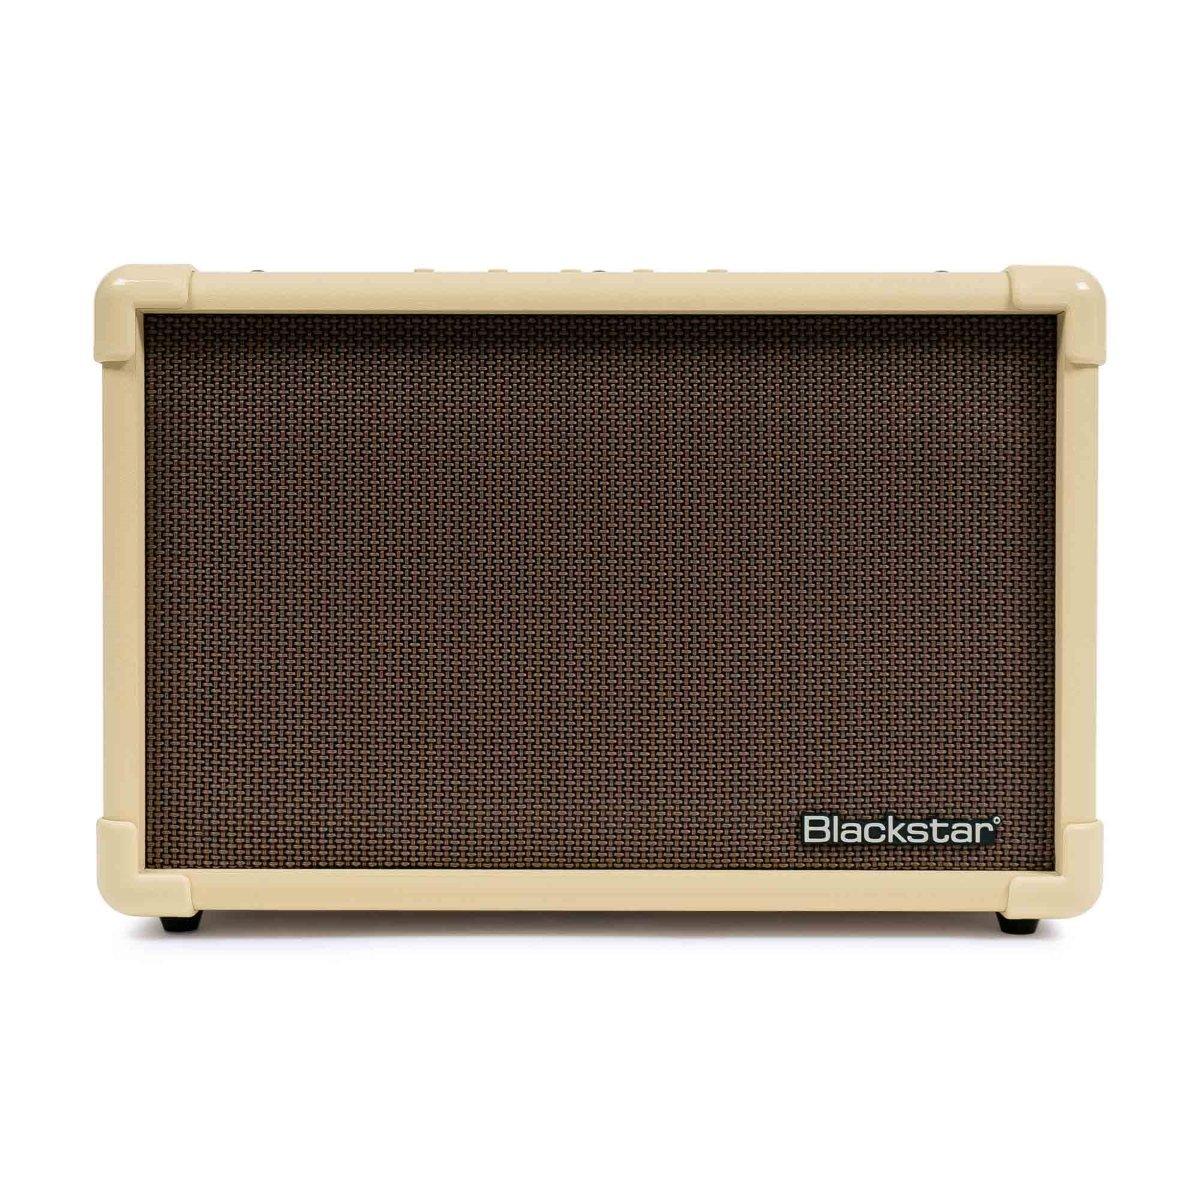 Blackstar Acoustic:Core 30W Stereo Acoustic Guitar Amp